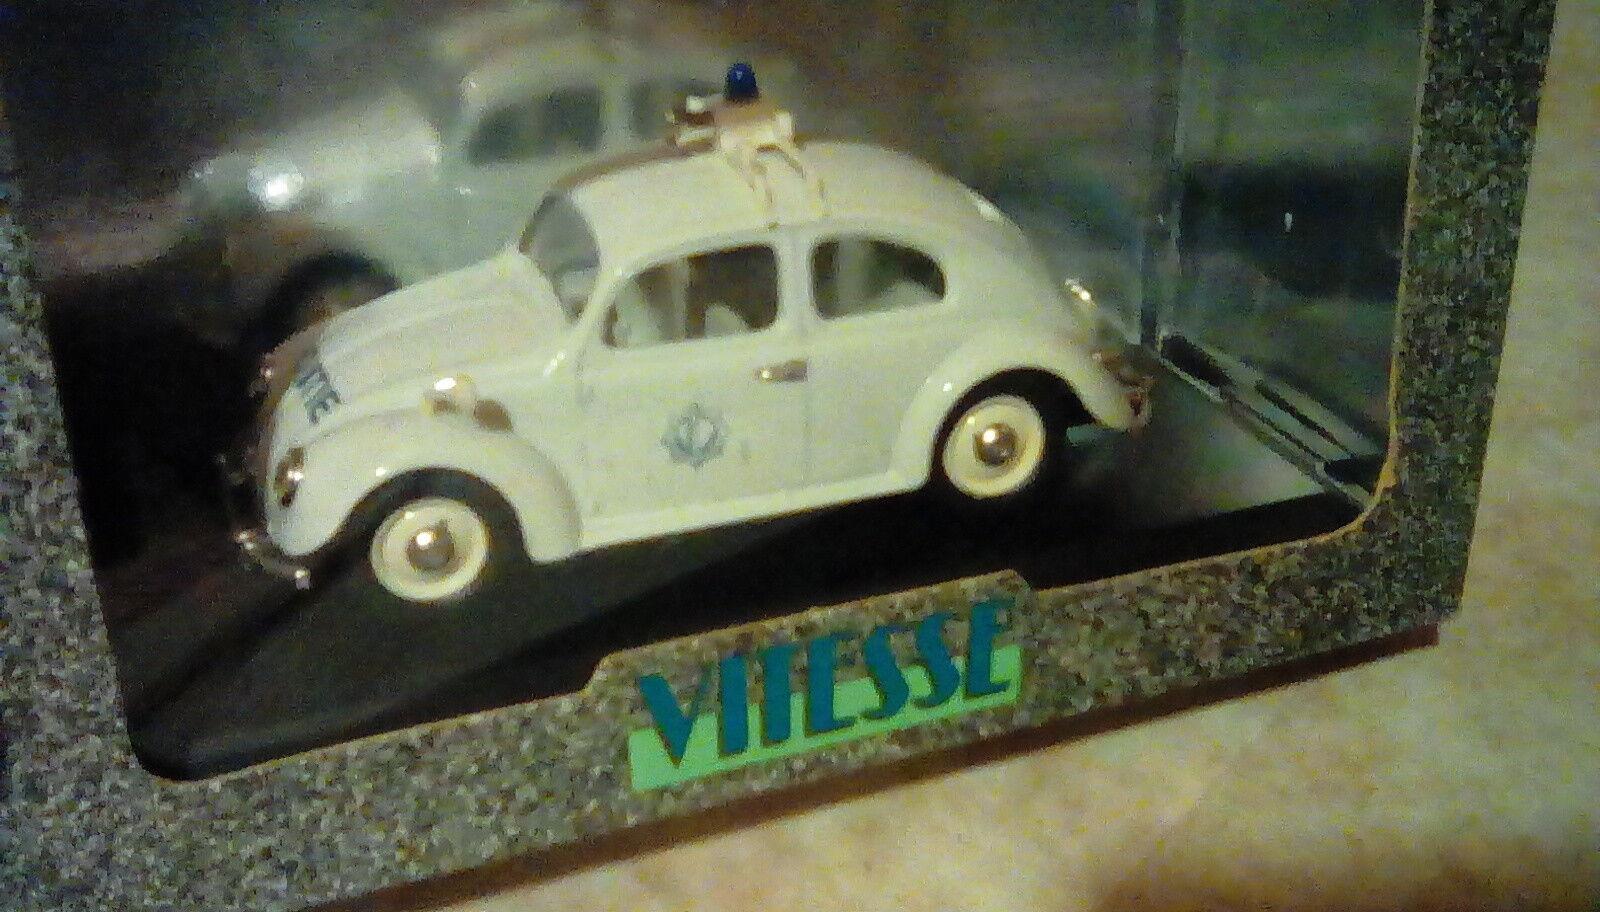 SCARCE SCARCE SCARCE VITESSE VW T1 BEETLE POLITIE BELGIAN POLICE PROMO 1 43 LTD EDT MB 1 1000 ed5333